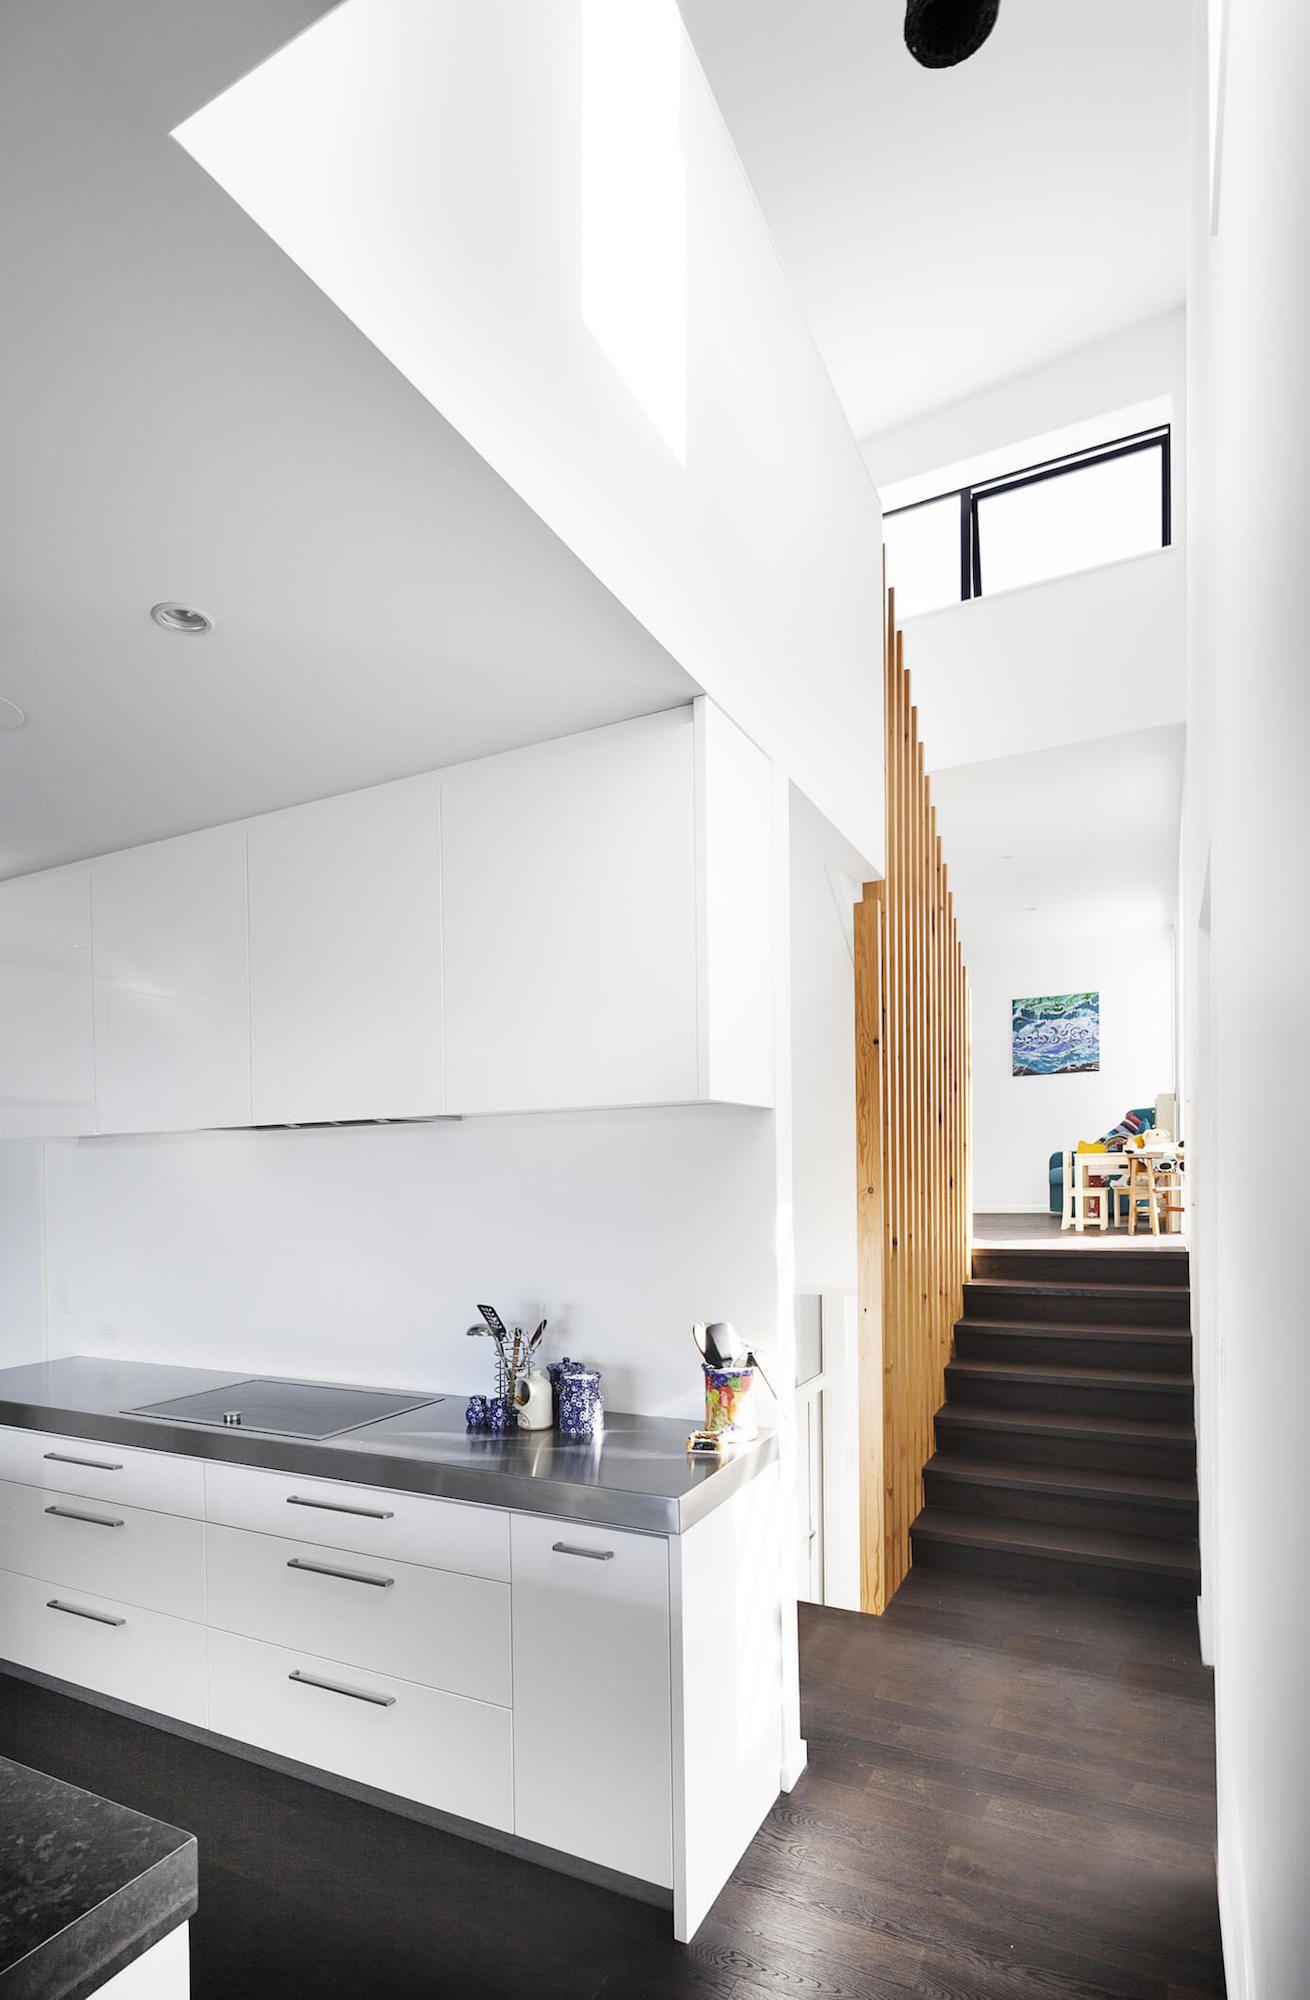 mclaren-house-archaus-architects-08